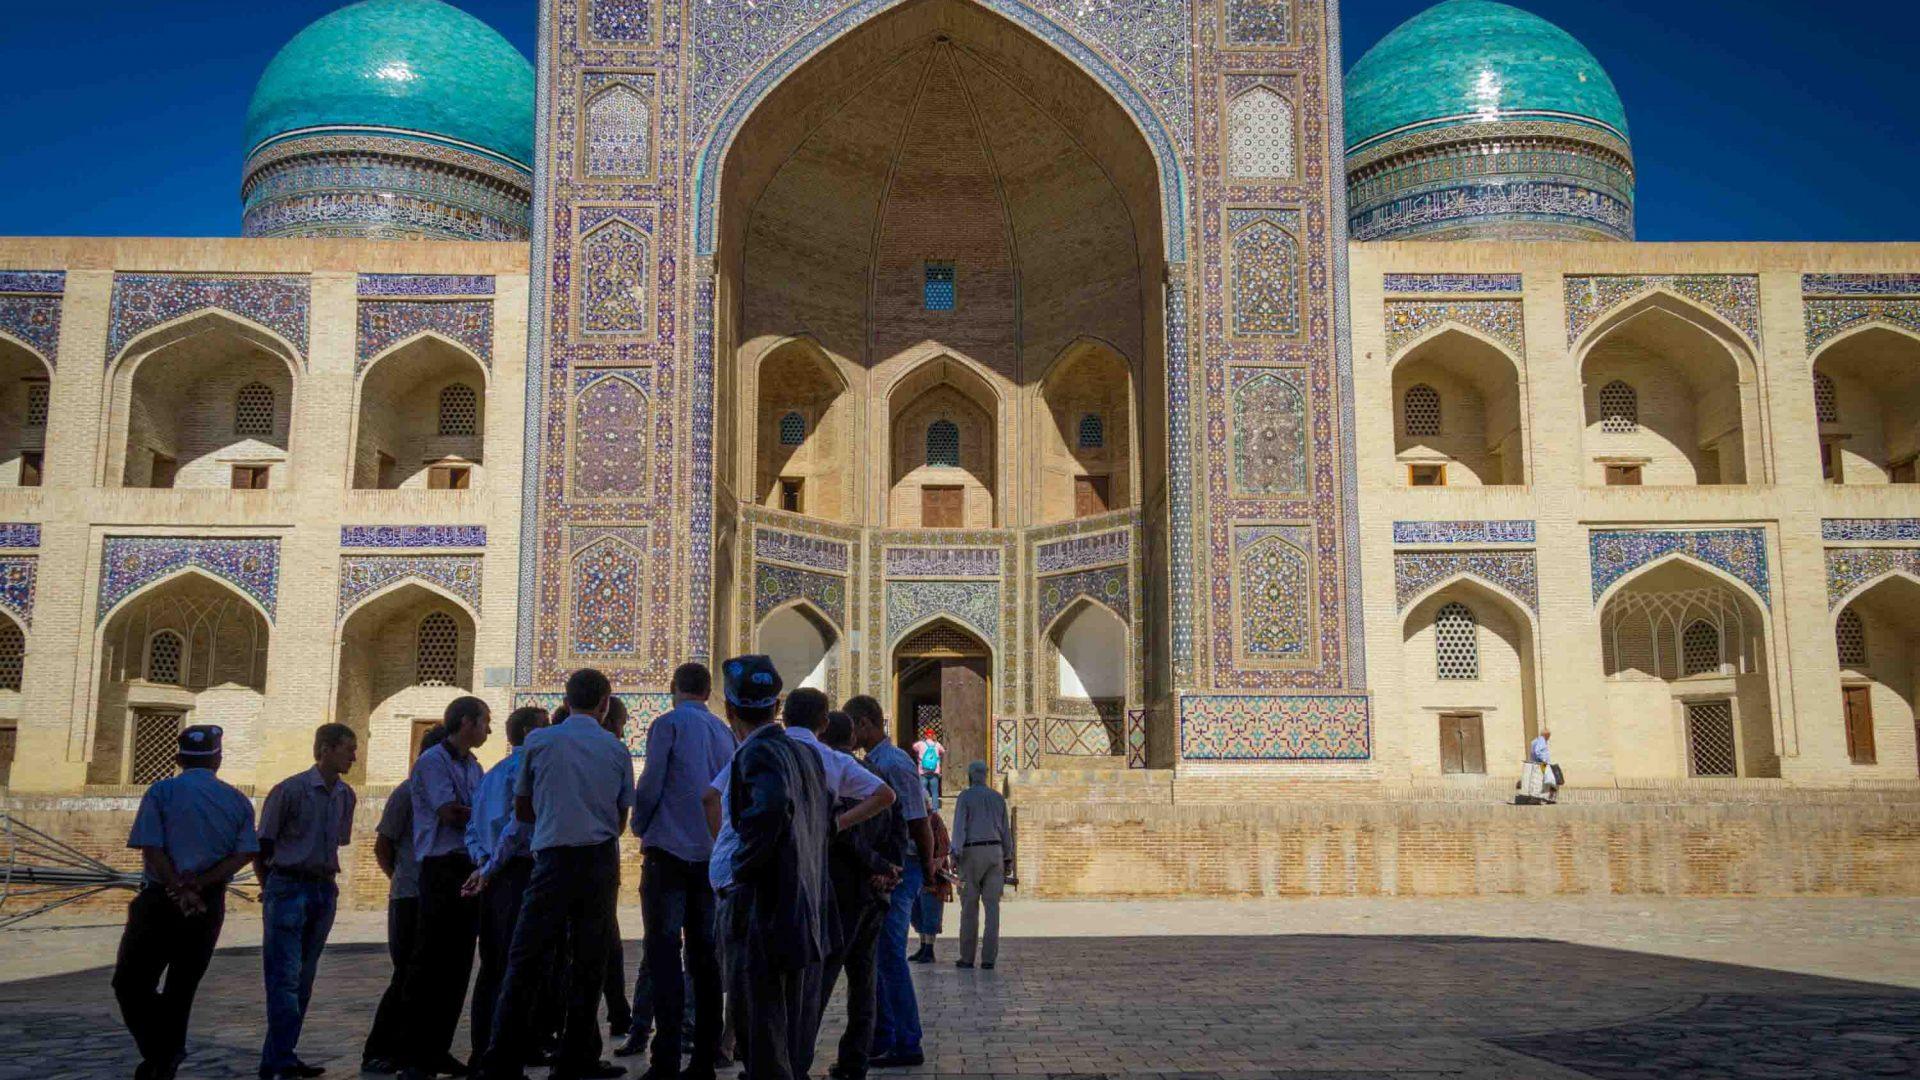 Po-i-Kalyan Square, Bukhara, Uzbekistan.